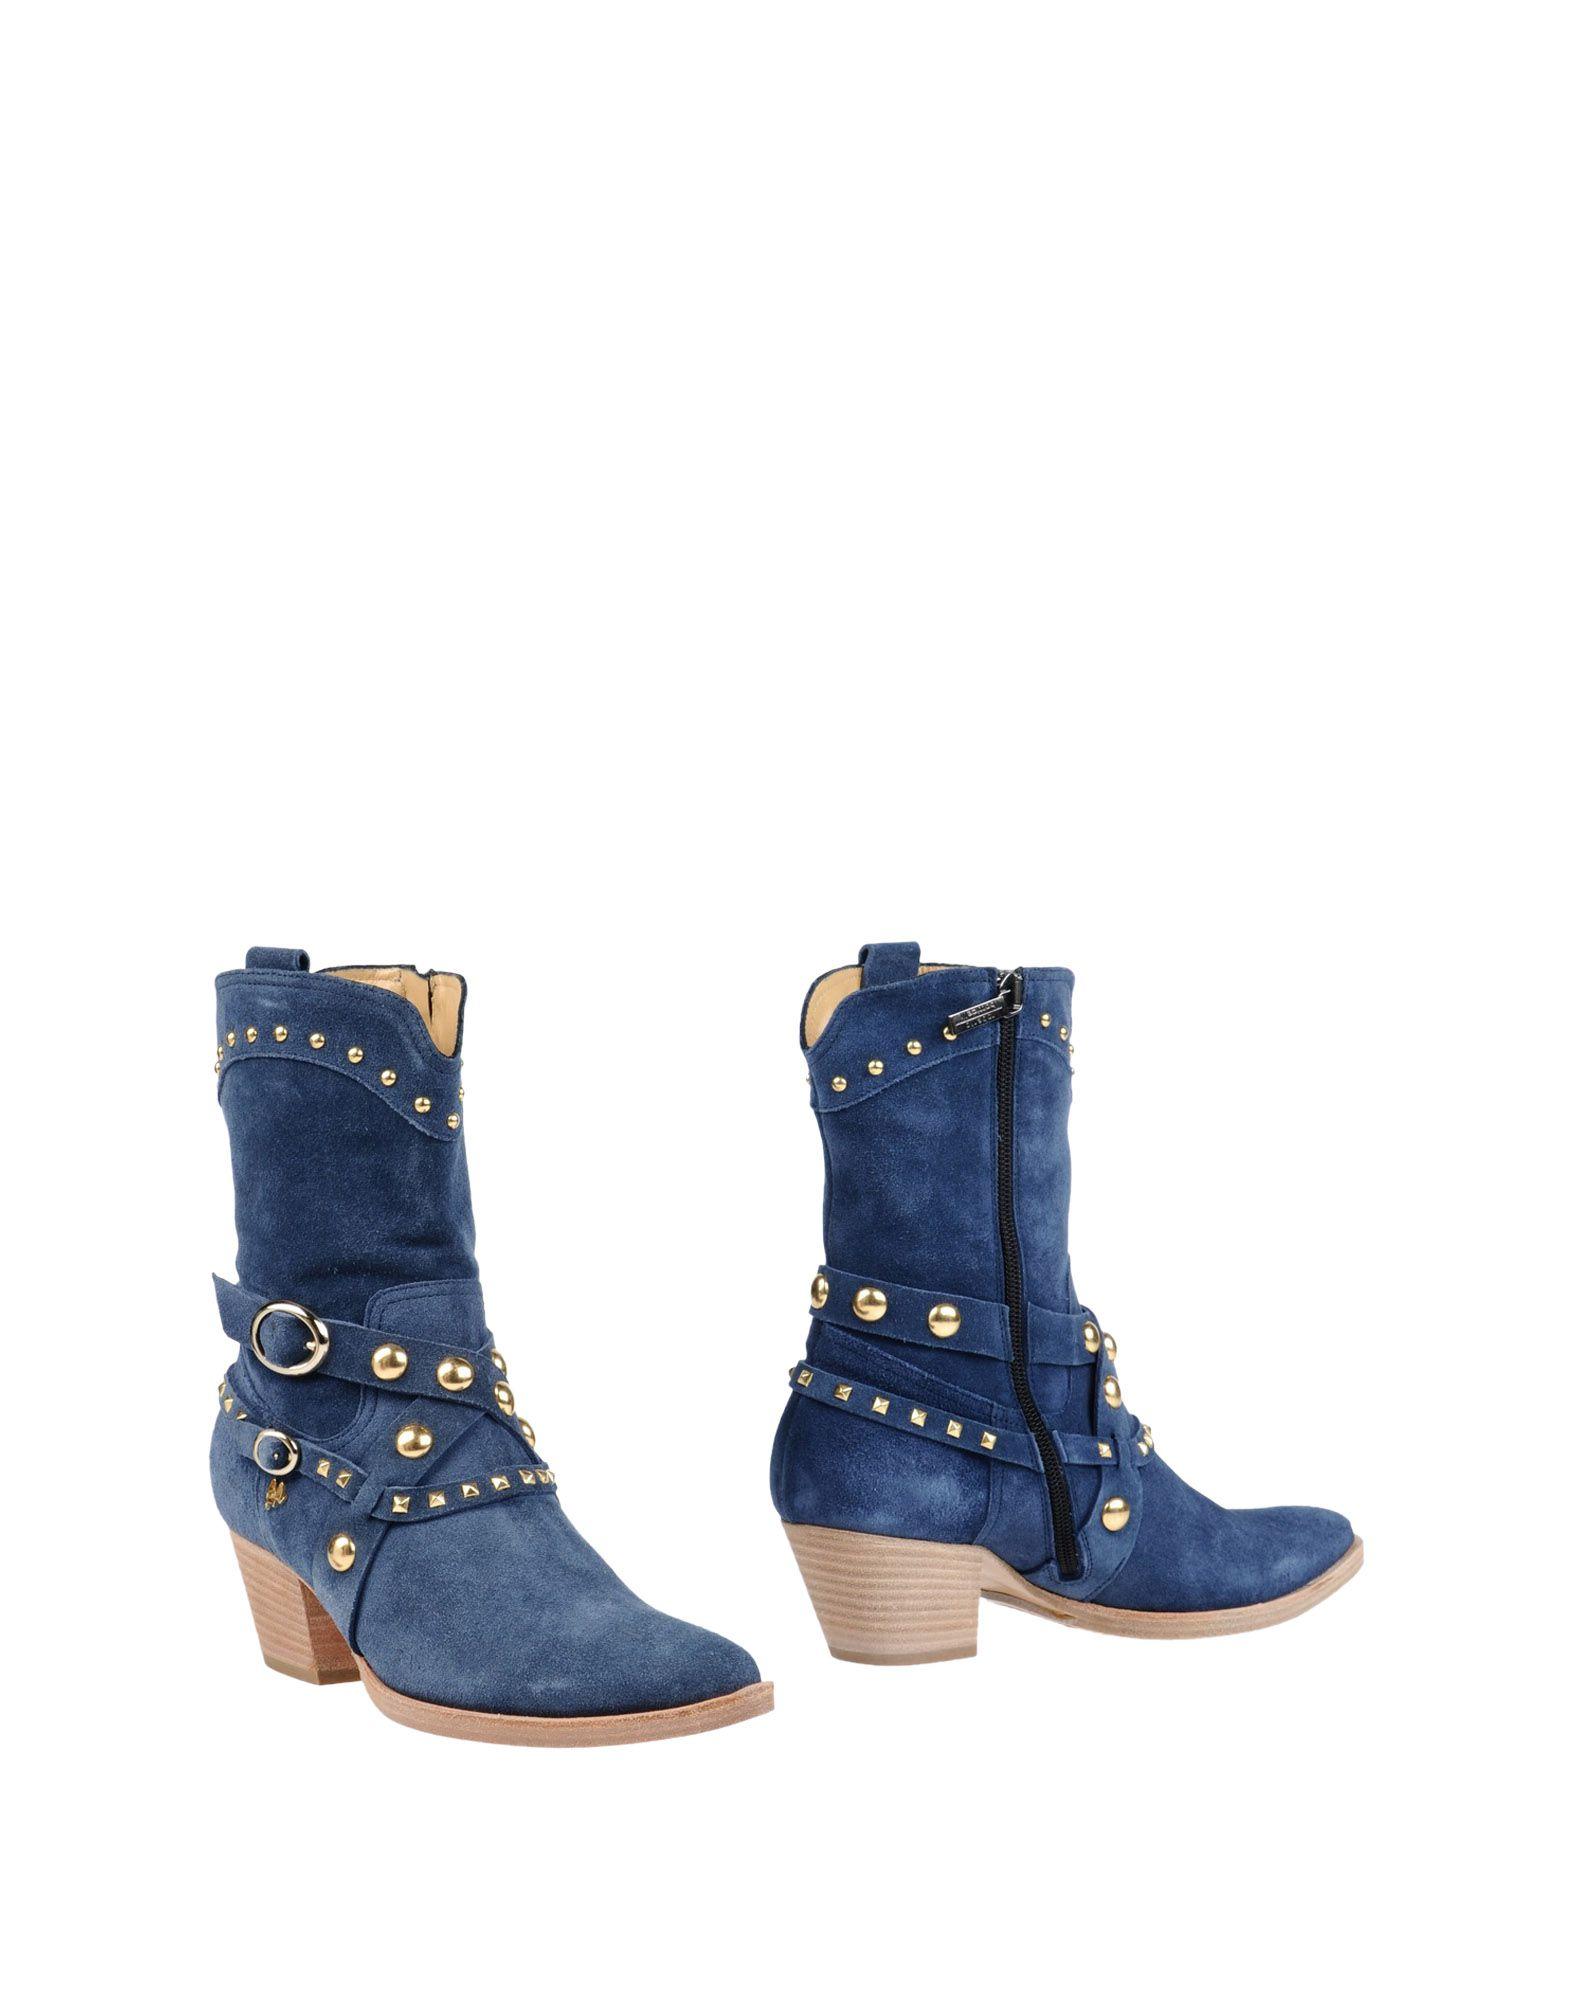 roberto botticelli luxury полусапоги и высокие ботинки ROBERTO BOTTICELLI Полусапоги и высокие ботинки